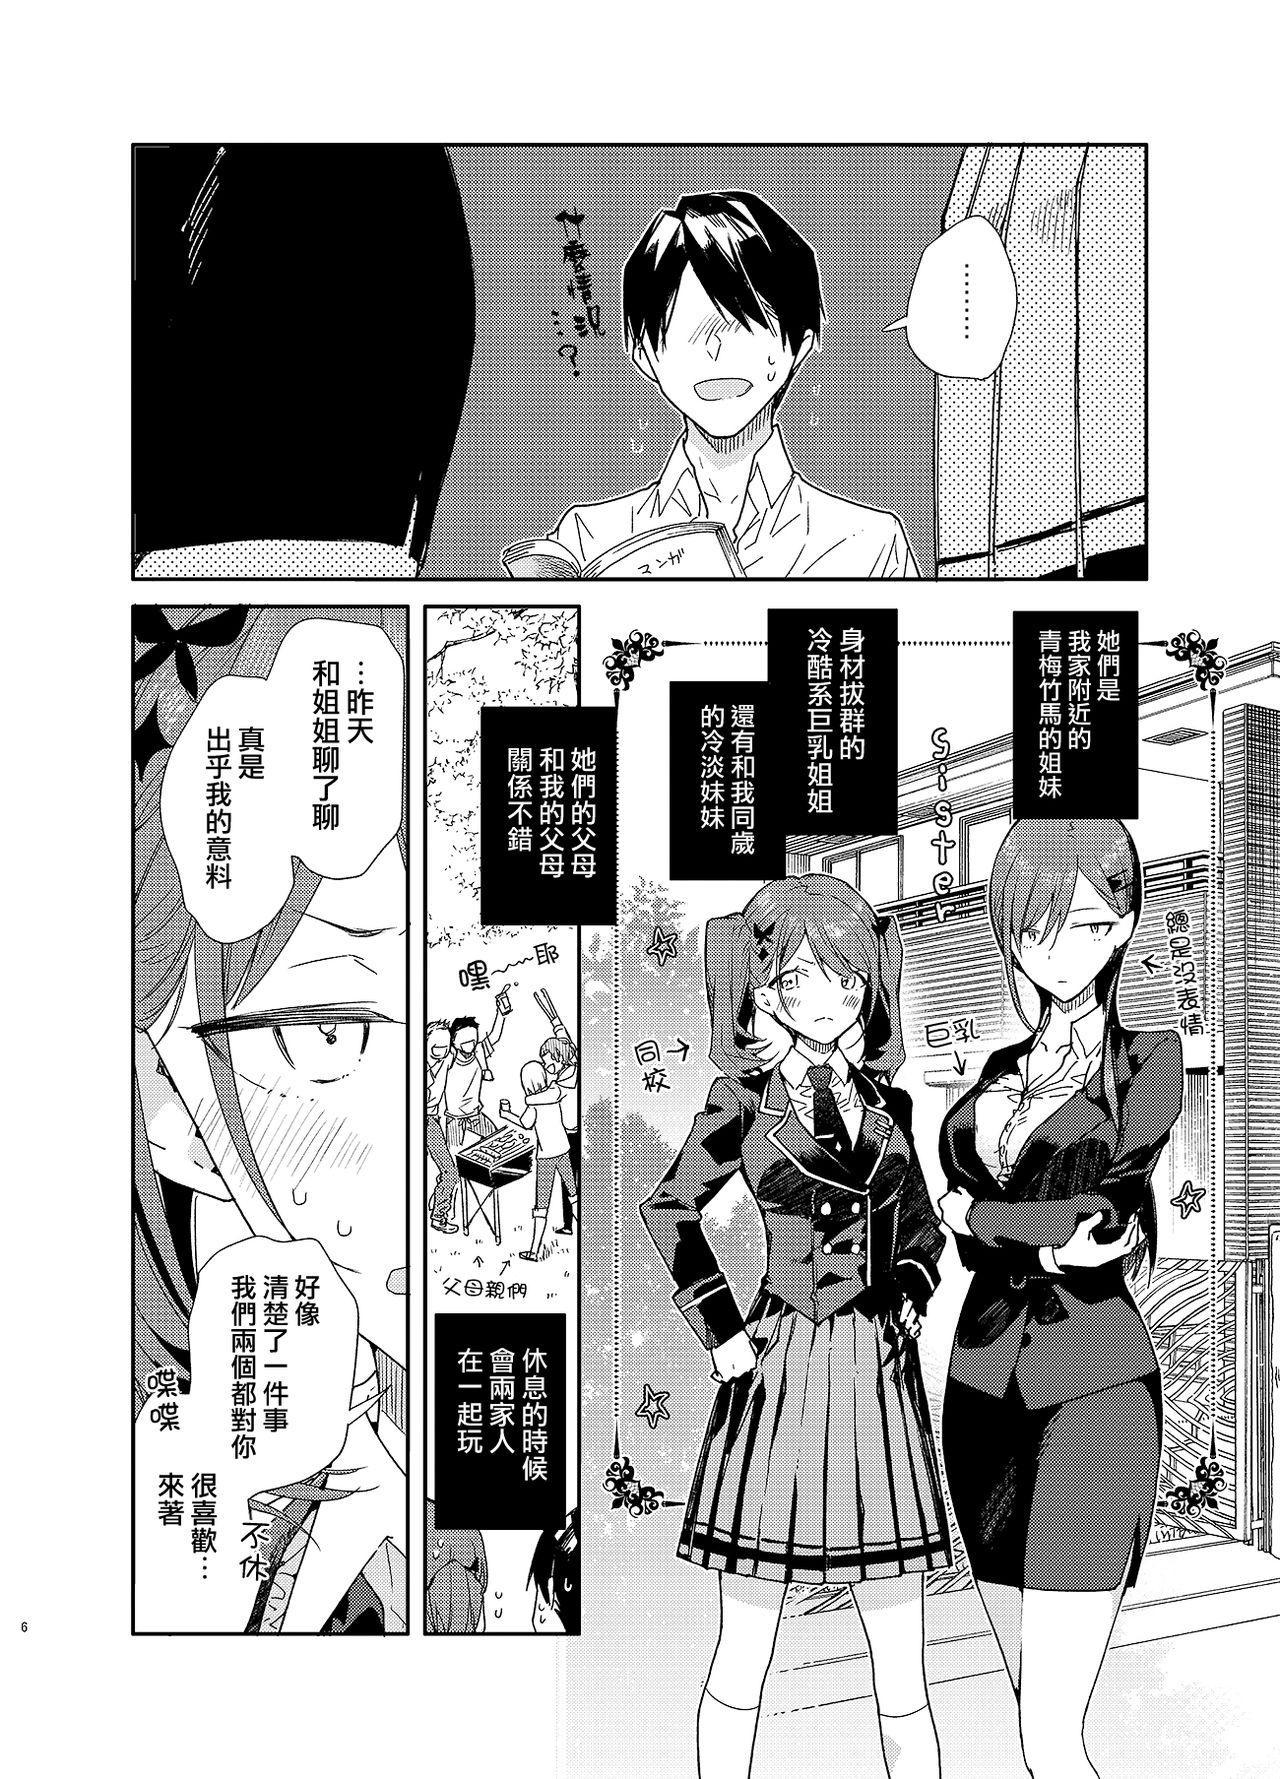 Kinjo no Tsuntsun Imouto to Muhyoujou Ane ni Semarare Ecchi   被附近的冷淡妹妹和無表情的姐姐強行做愛 6